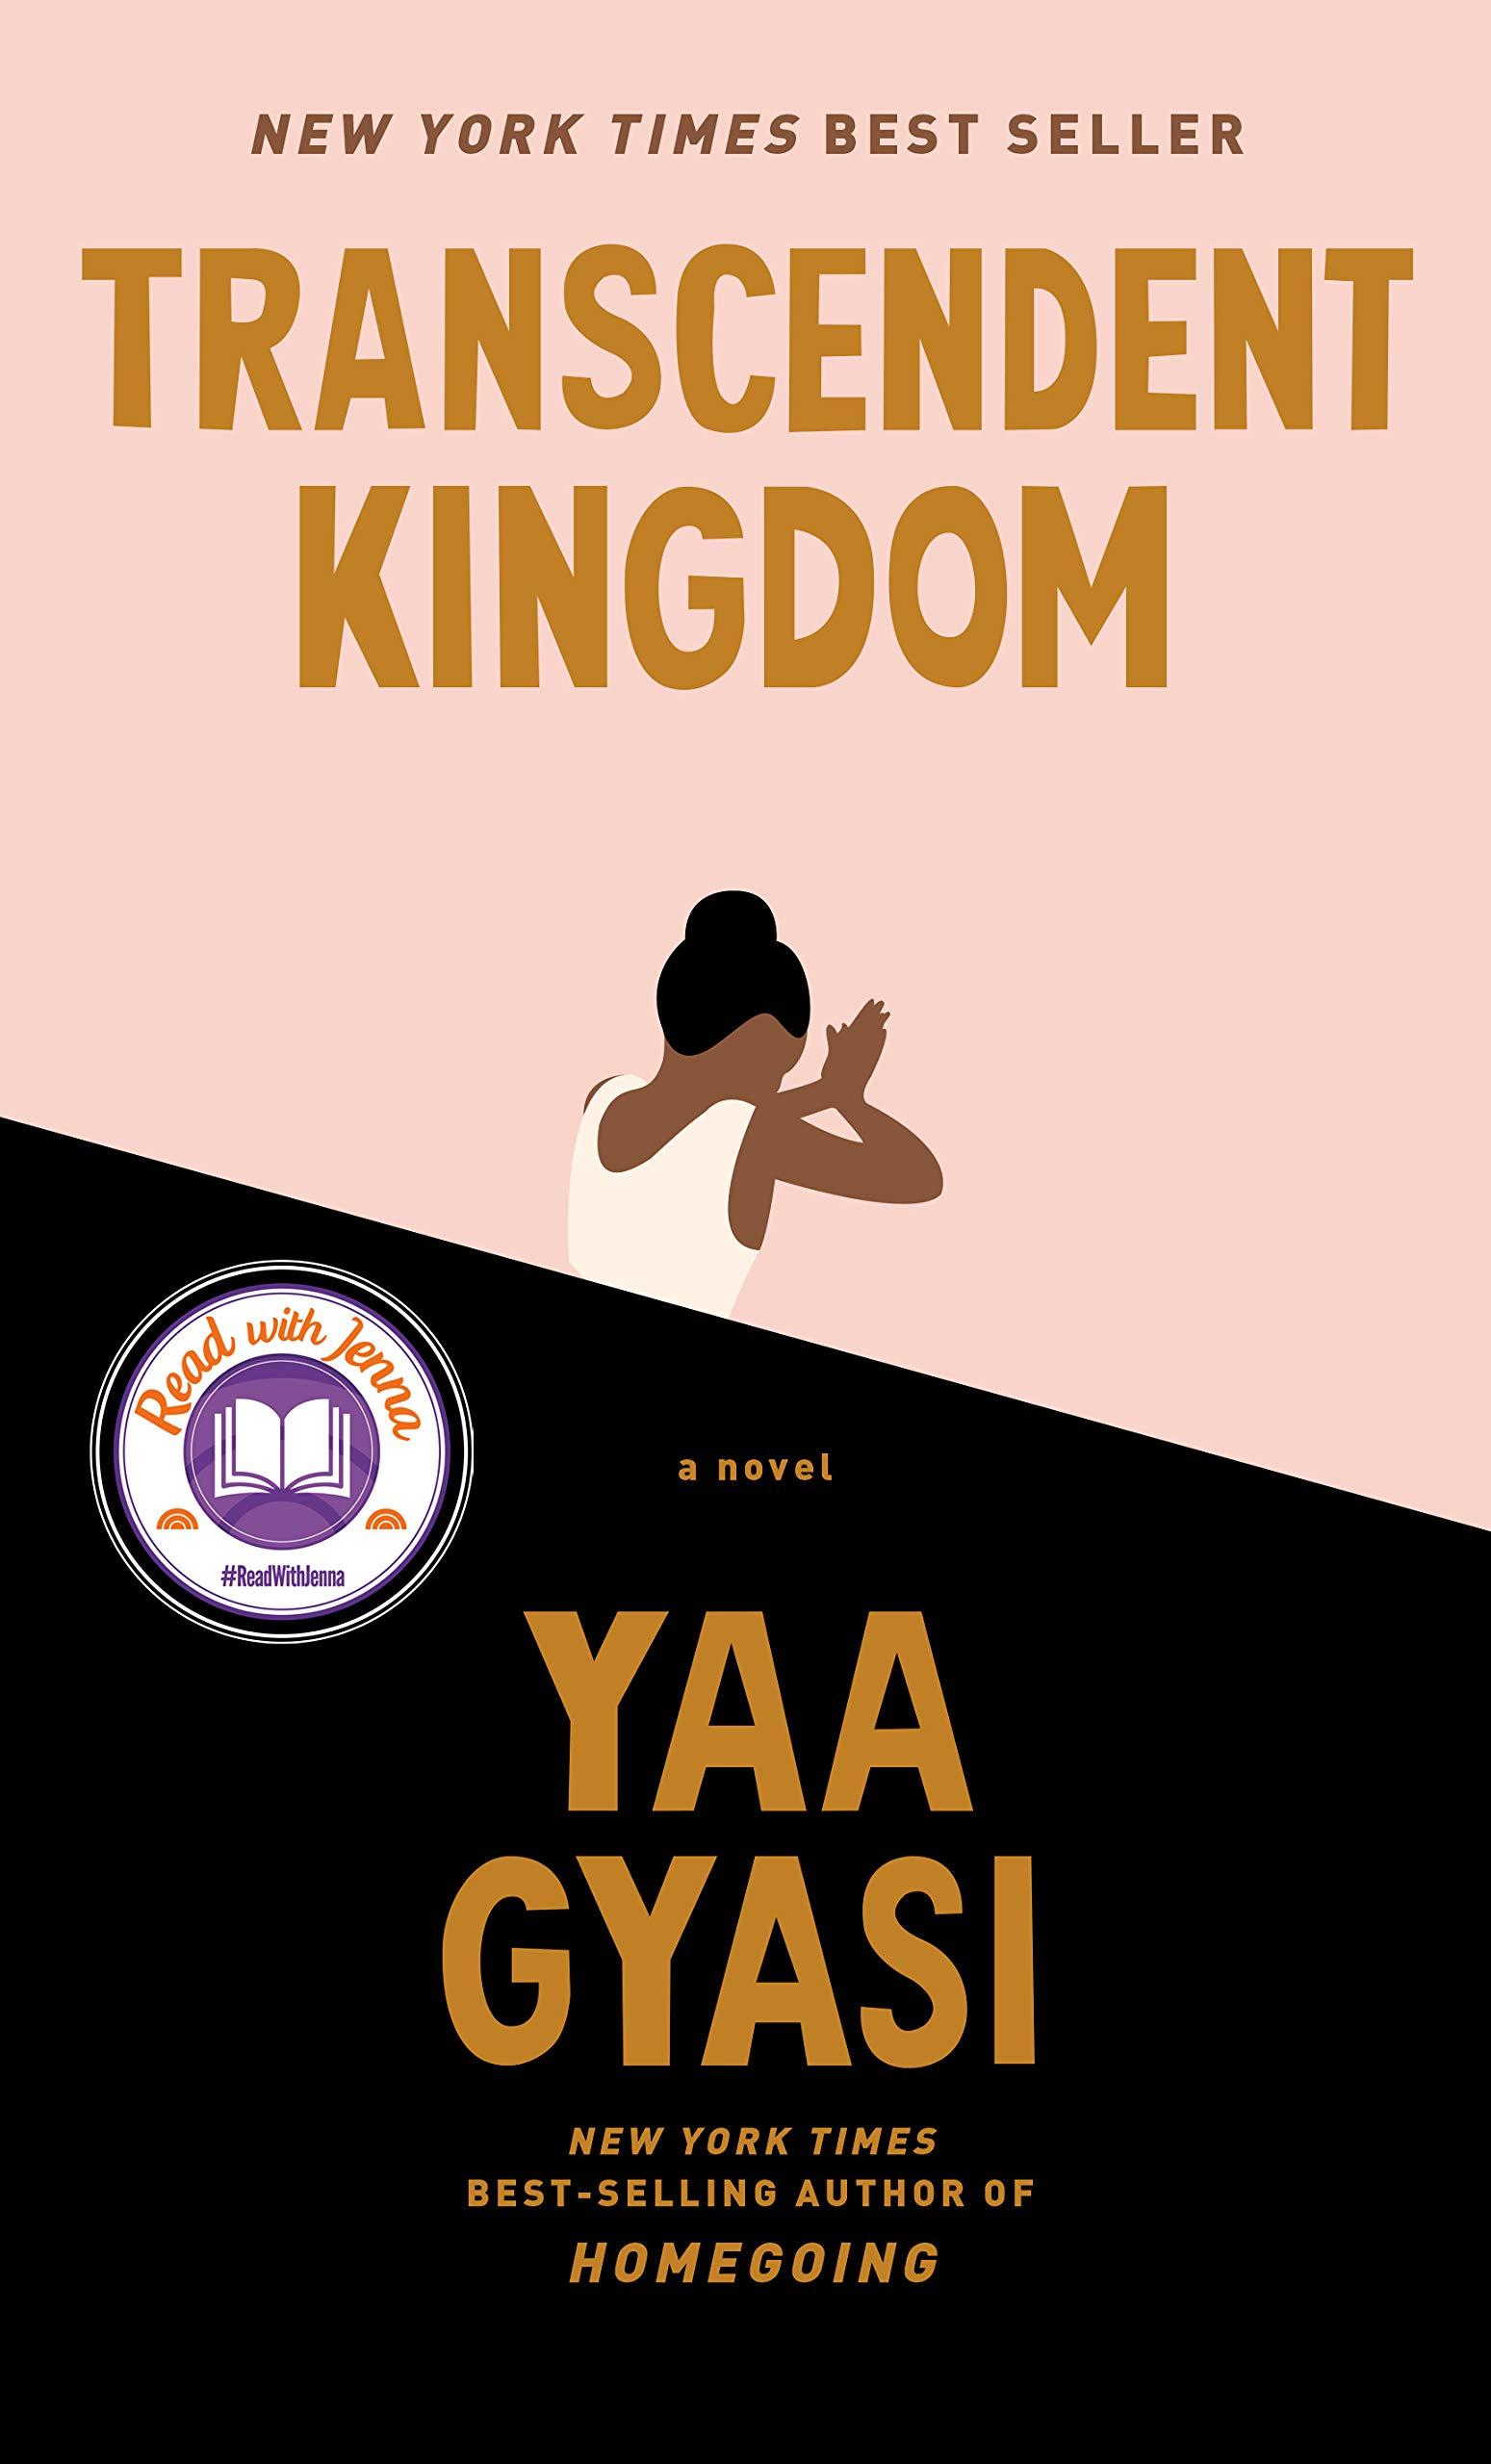 Amazon.com: Transcendent Kingdom: A novel (9780525658184): Gyasi, Yaa: Books